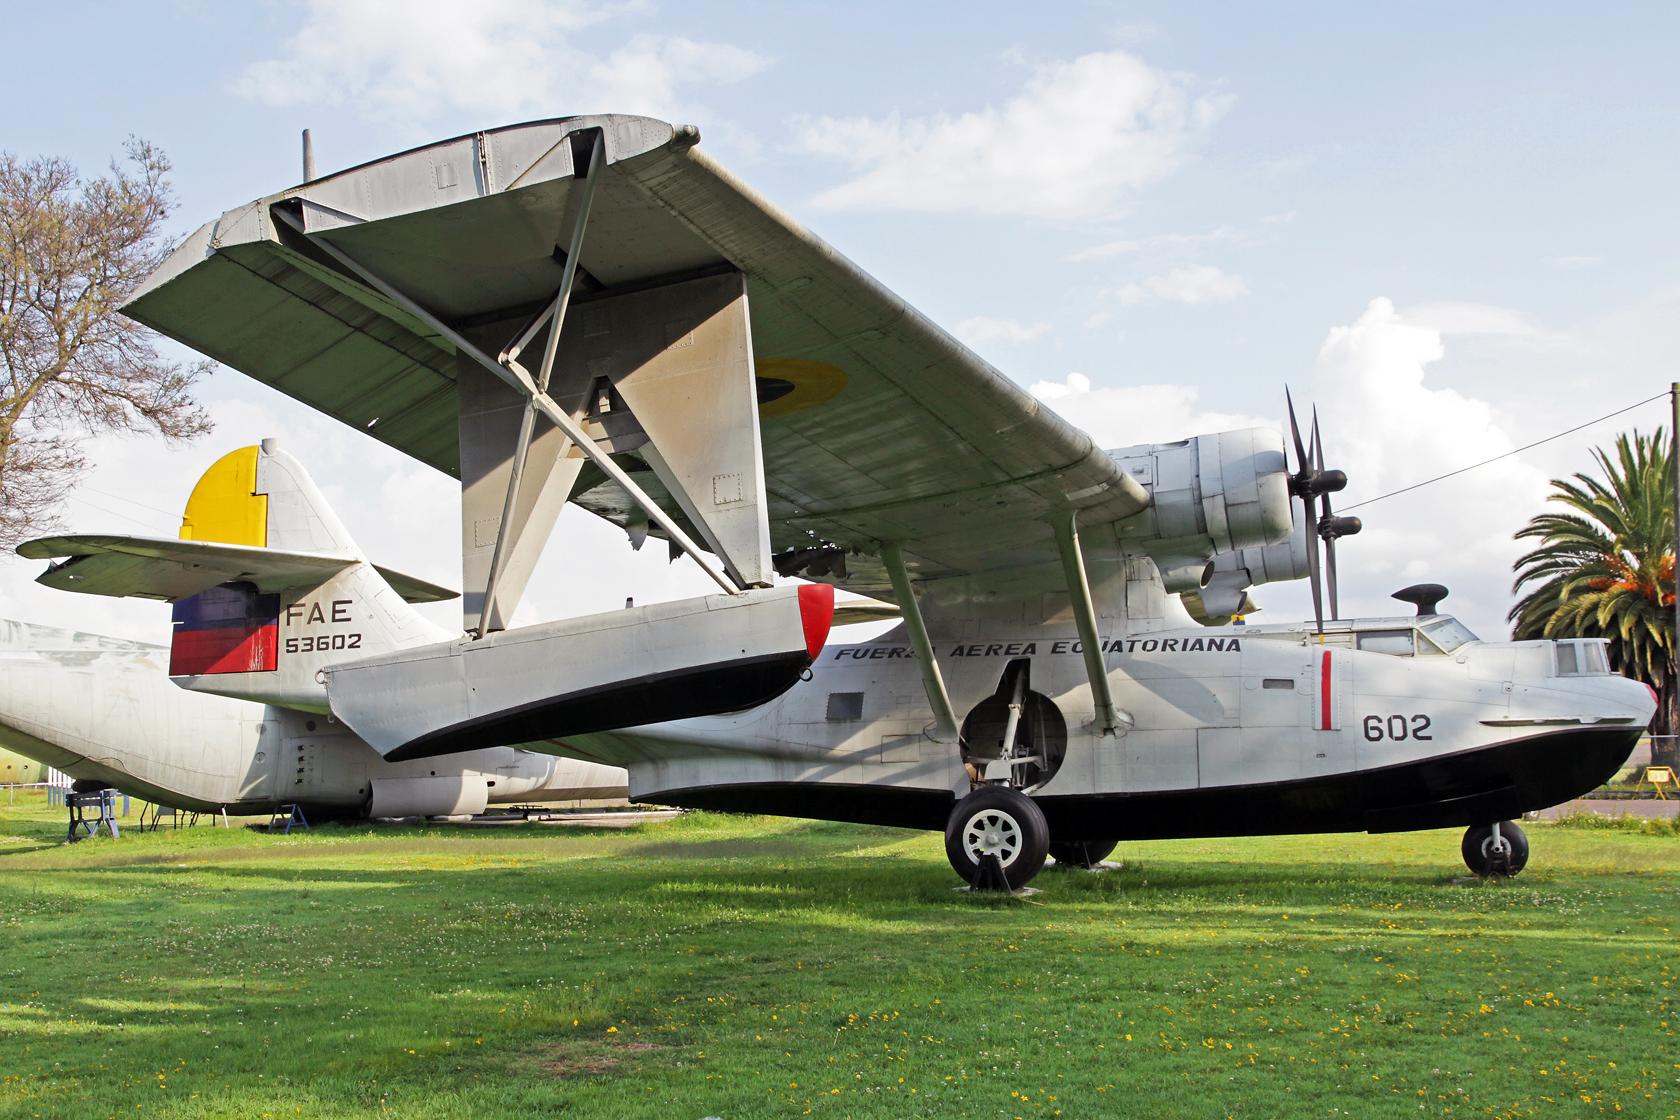 Fuerza Aérea Ecuatoriana Consolidated PBY-5A Catalina FAE-53602